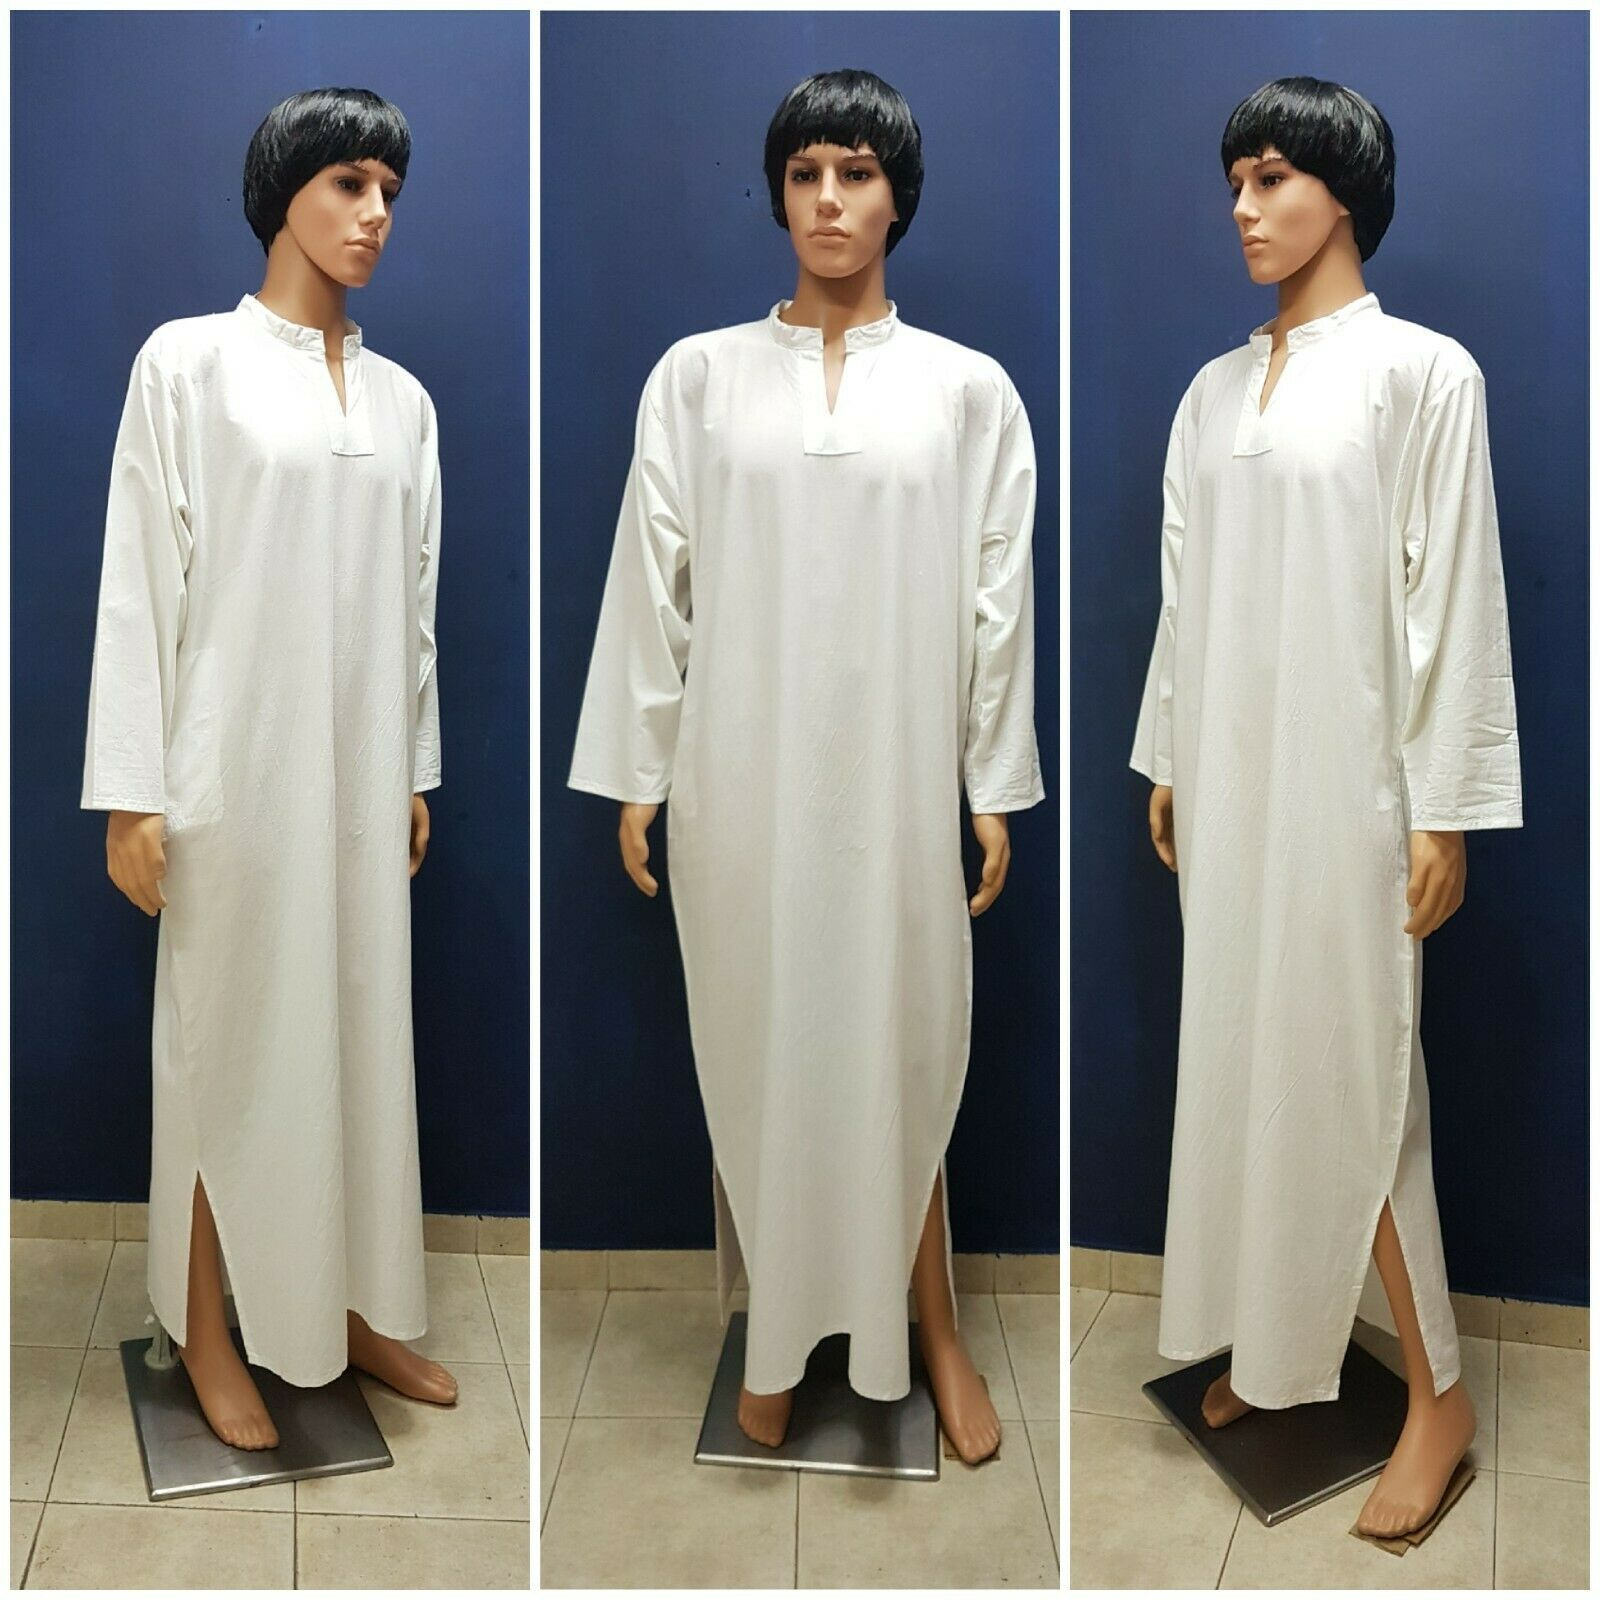 Men Jilbab Jalabiya Djellaba Kaftan WHITE COTTON Extra Large Combine Shipping!